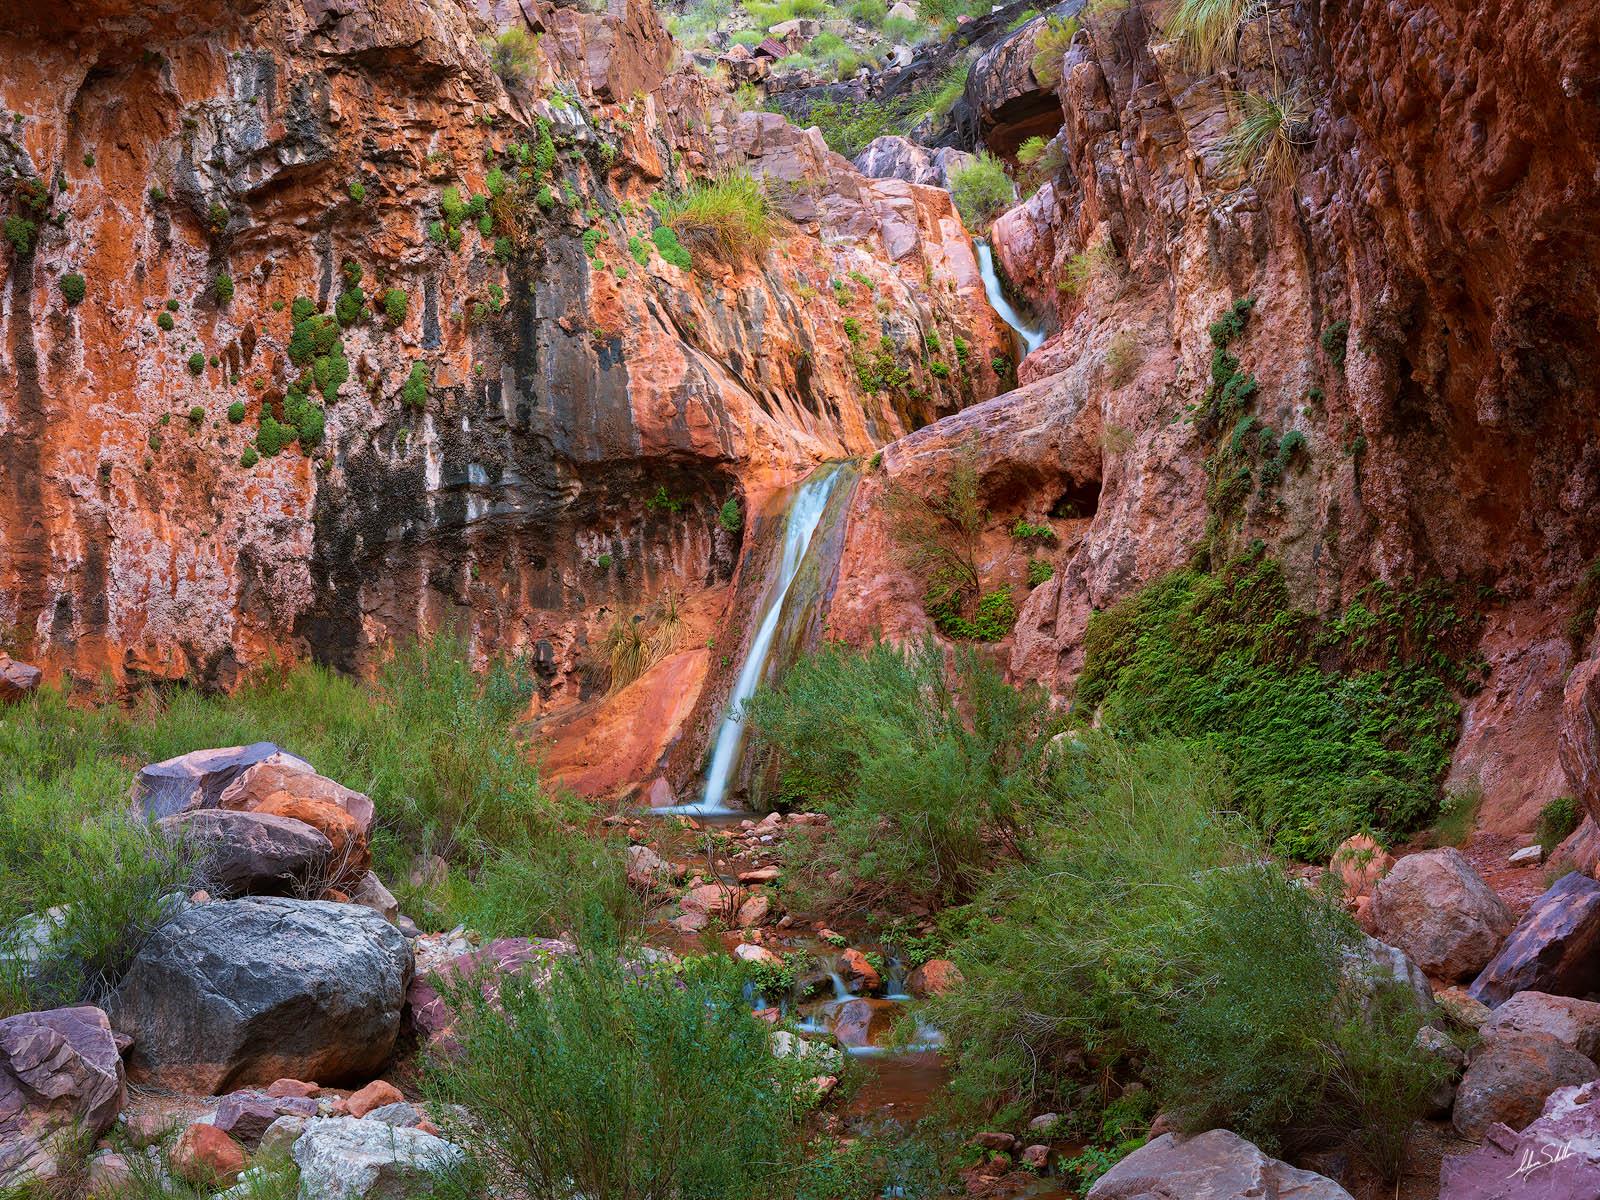 AZ, Arizona, Below the Rim, Colorado River, Expedition, Grand Canyon, Grotto, National Park, River Trip, Stone Creek, Waterfall, Waterfalls, photo